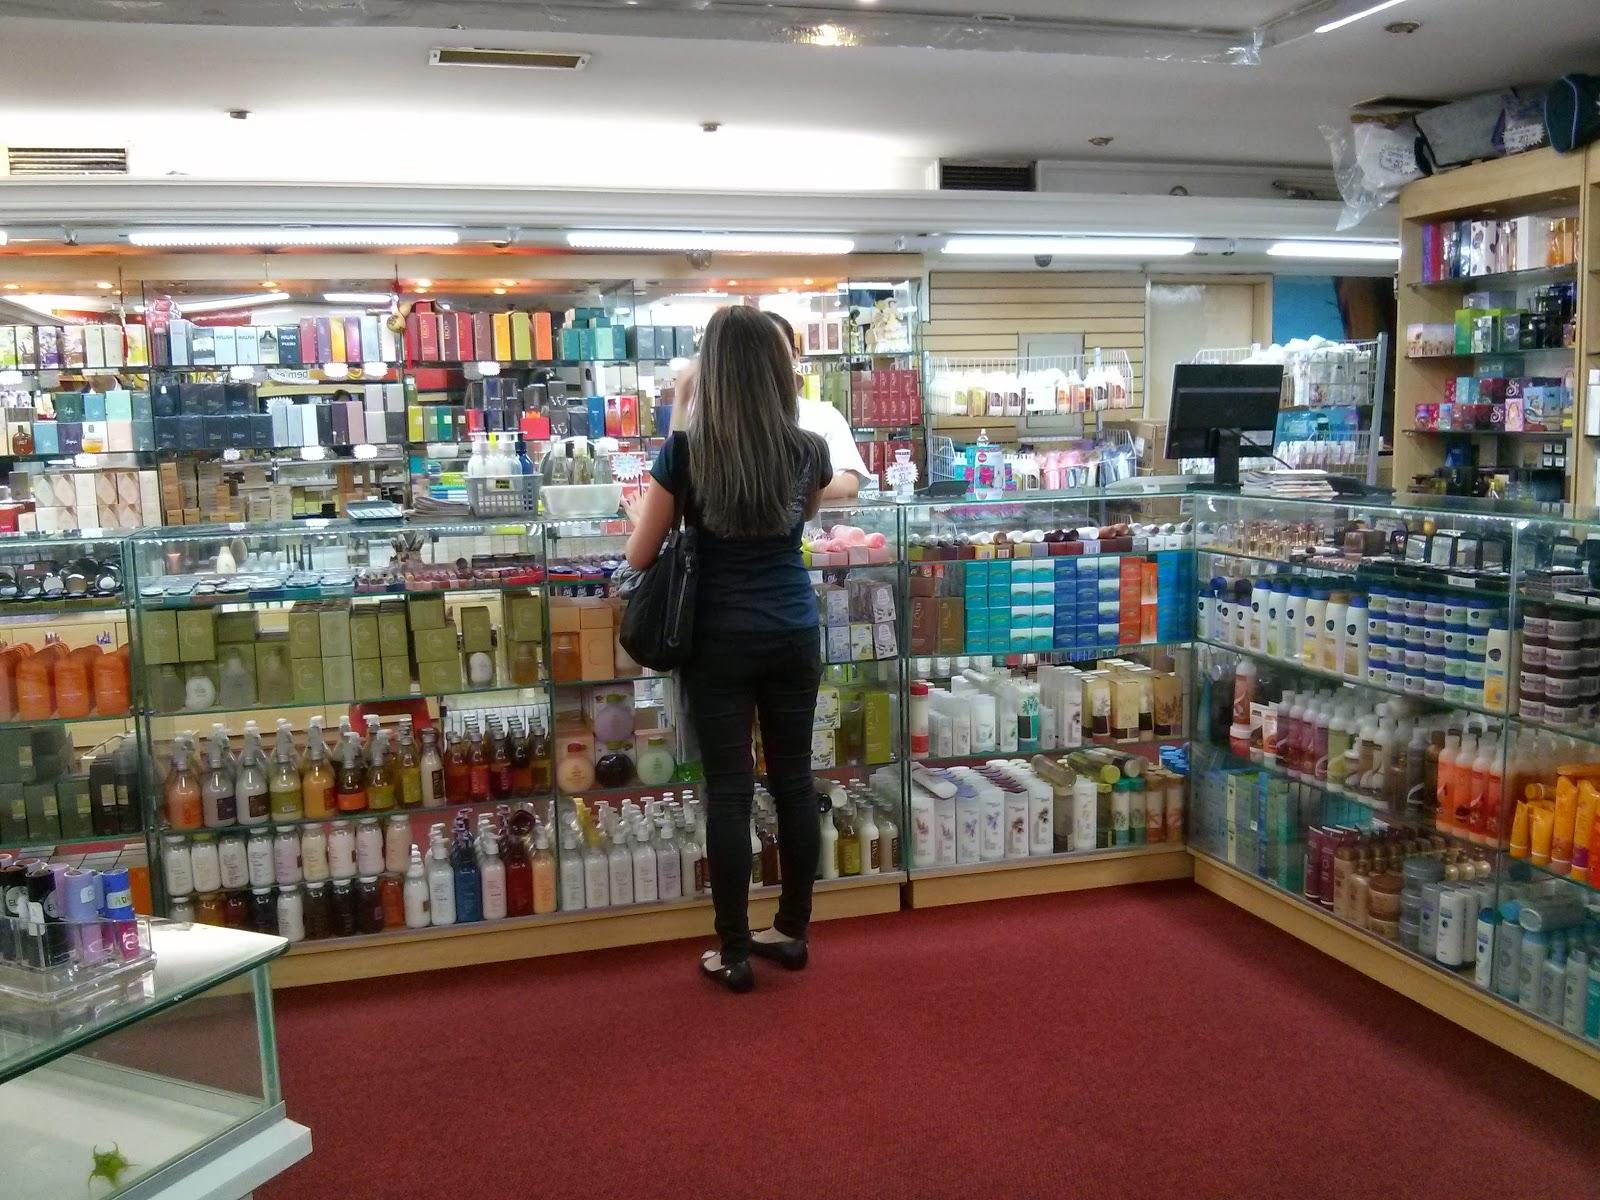 543eec50b A loja fica num mini shopping (Rua Galvão Bueno